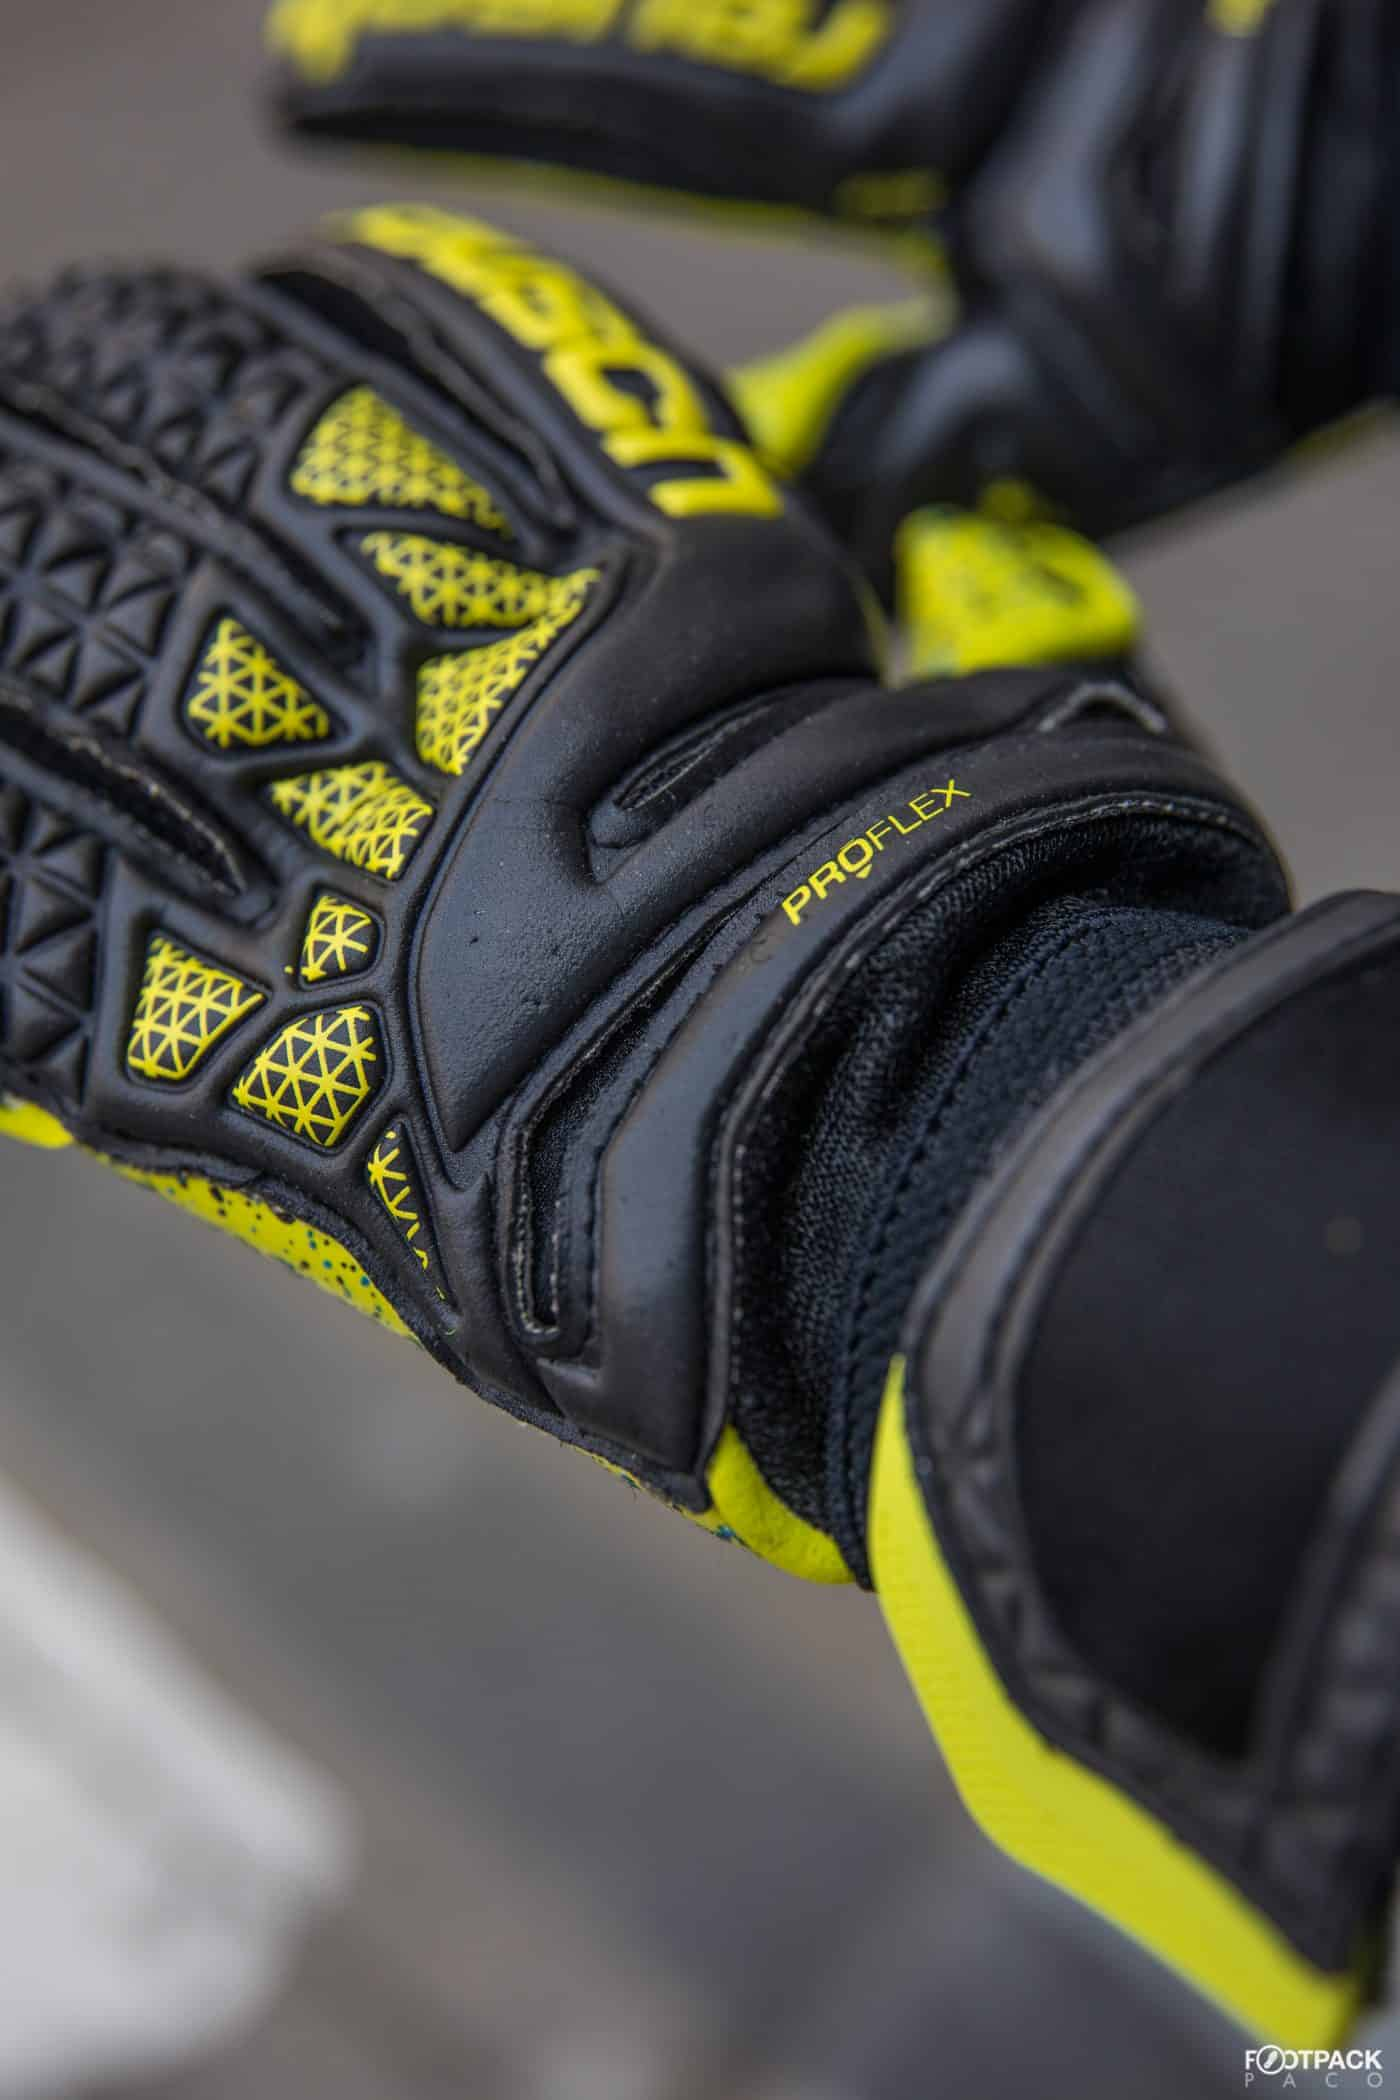 gant-reusch-fit-Control-Pro-G3-Fusion-HL-hugo-lloris-footpack-5